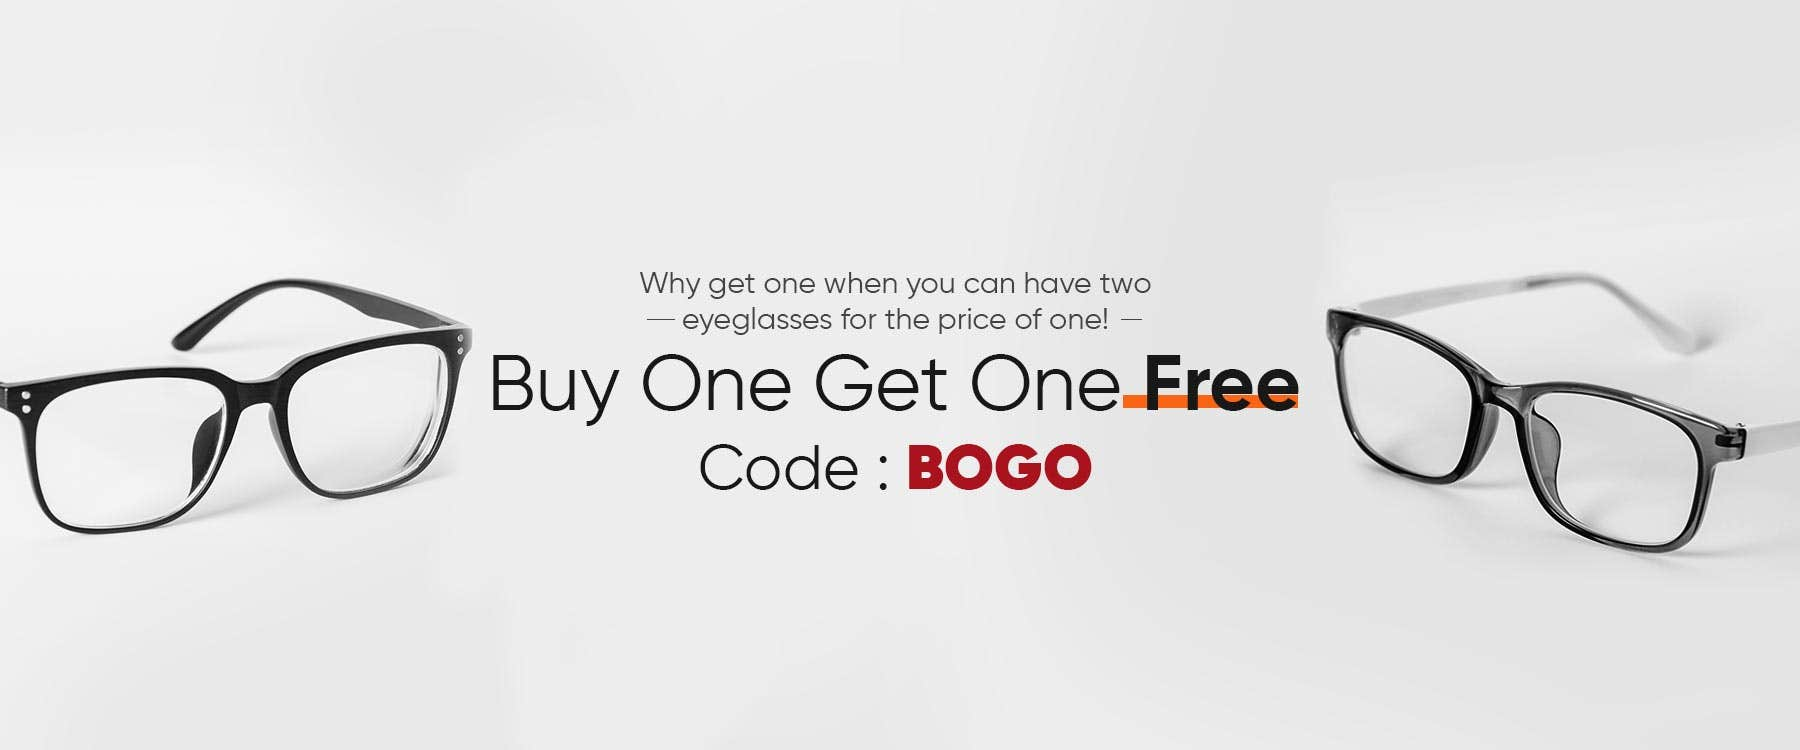 BUY 1 GET 1 FREE CODE: BOGO